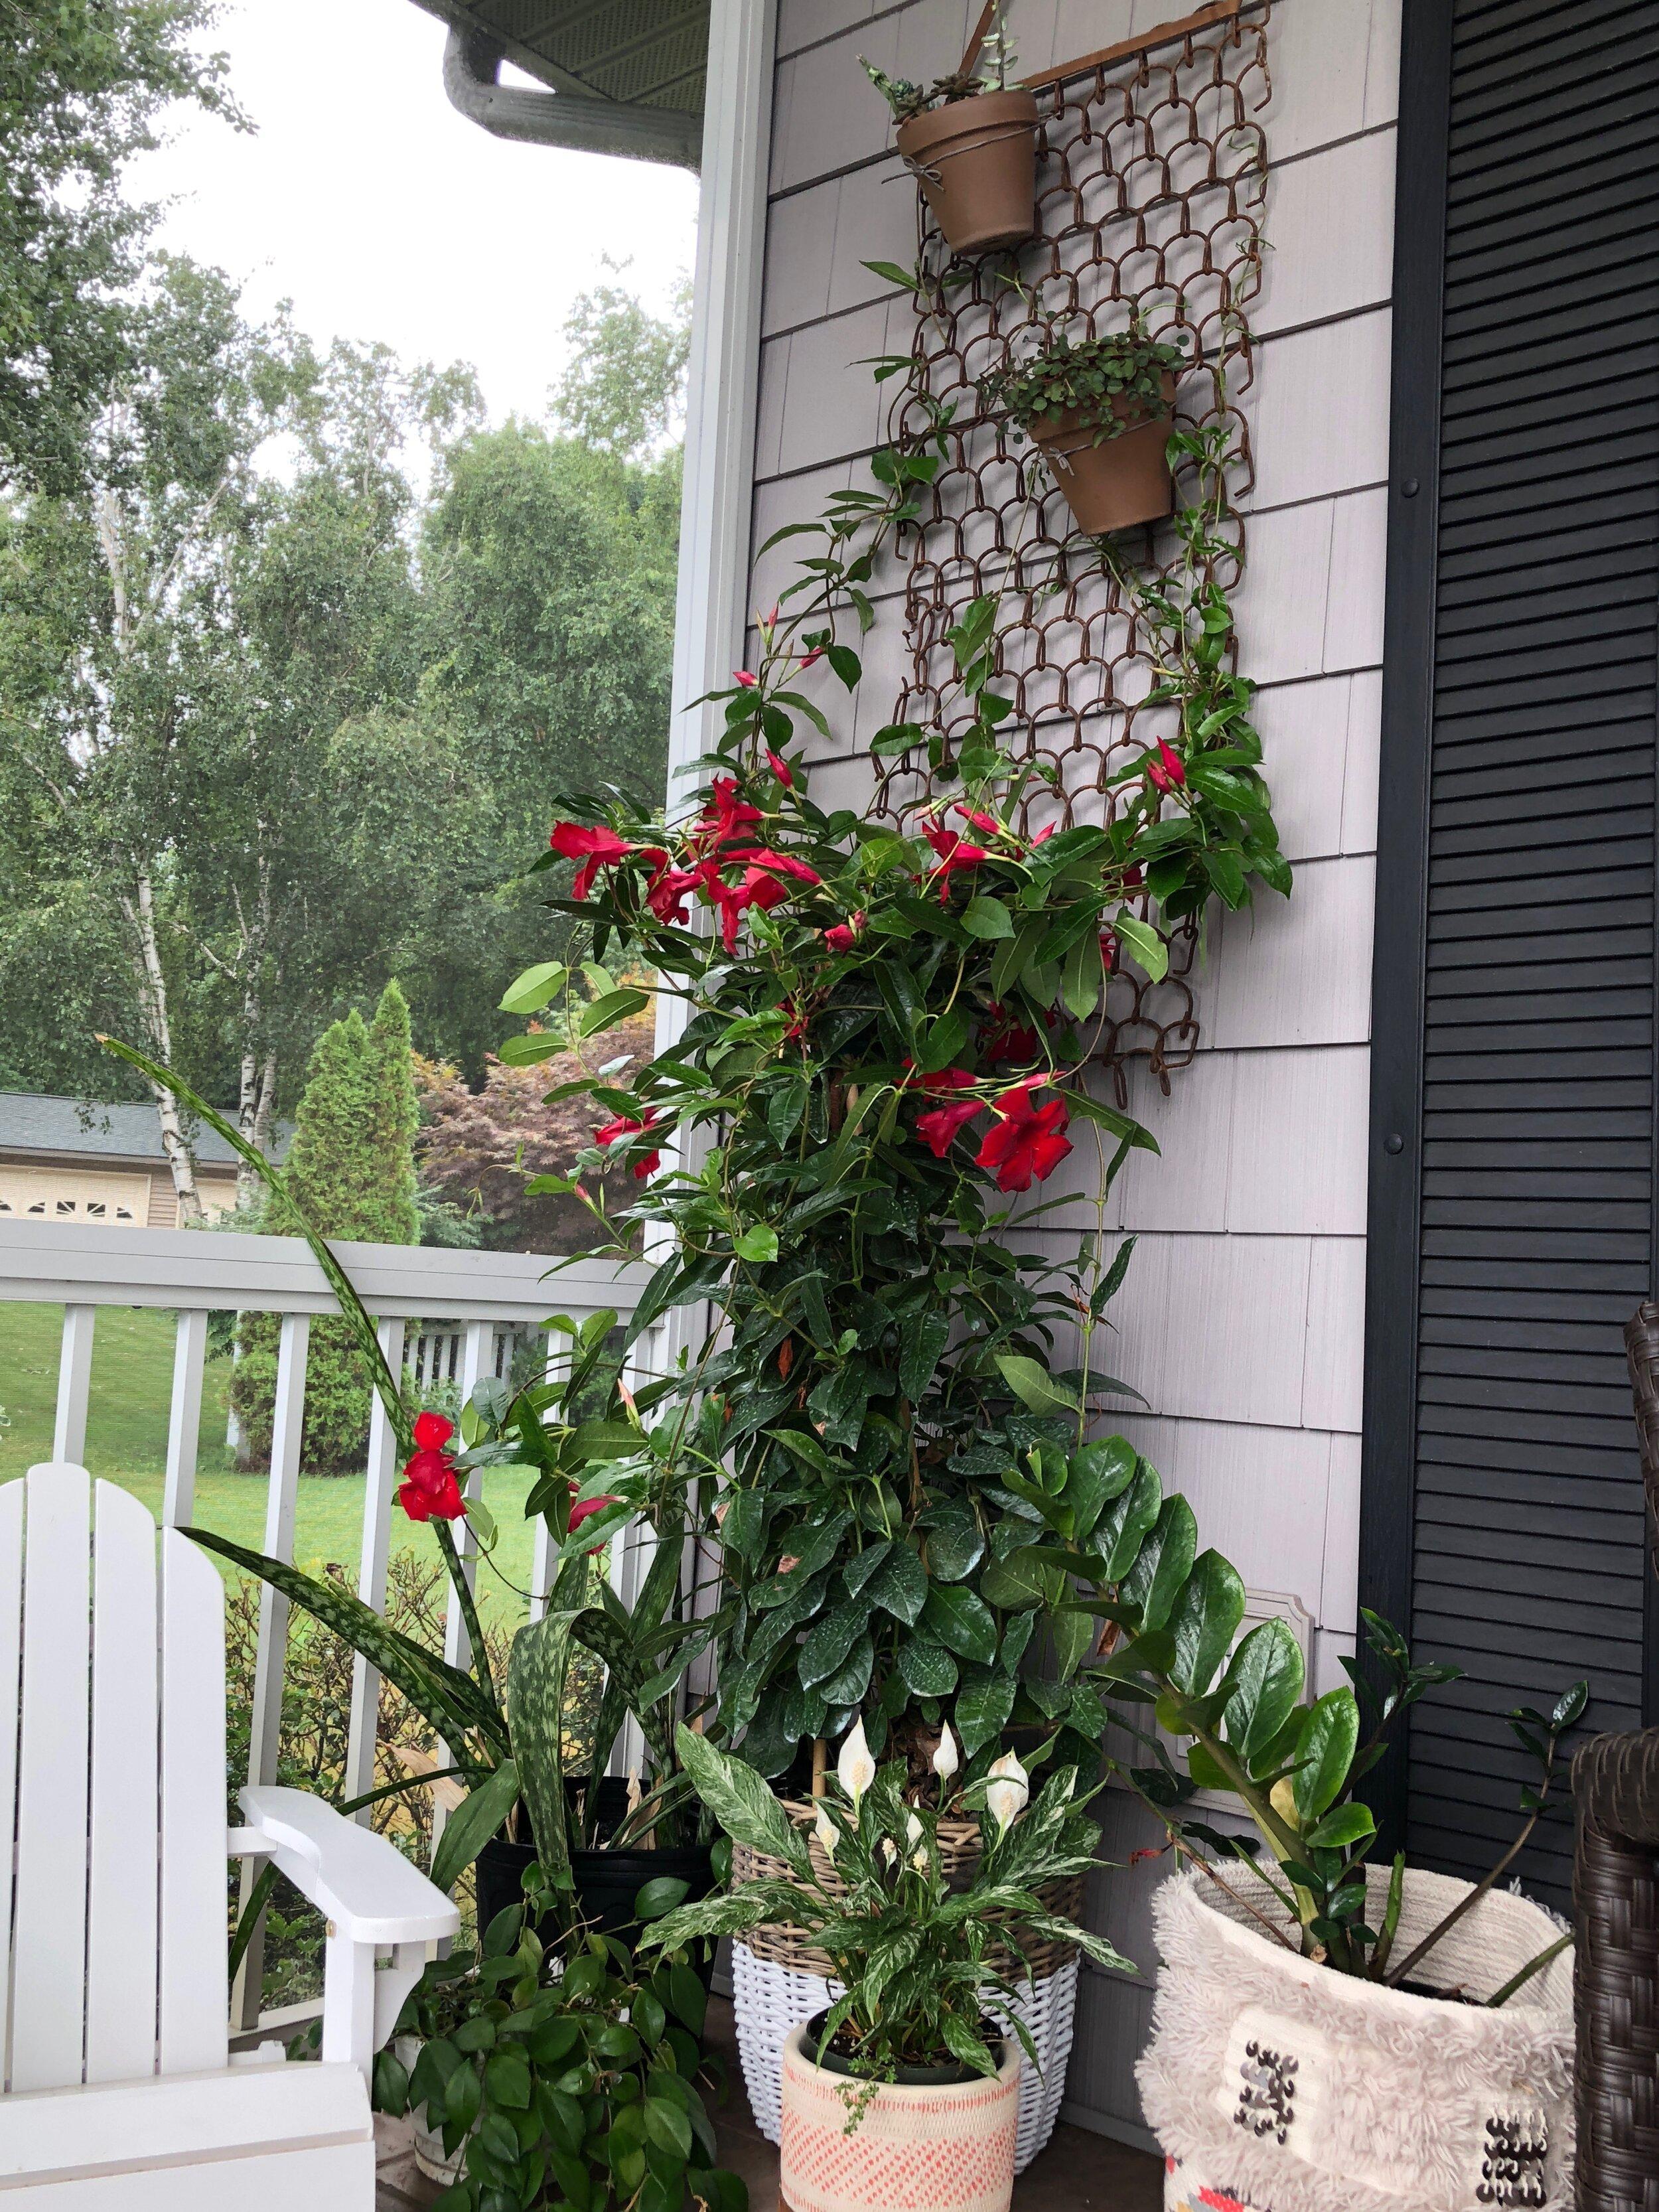 Trailing plants on porch